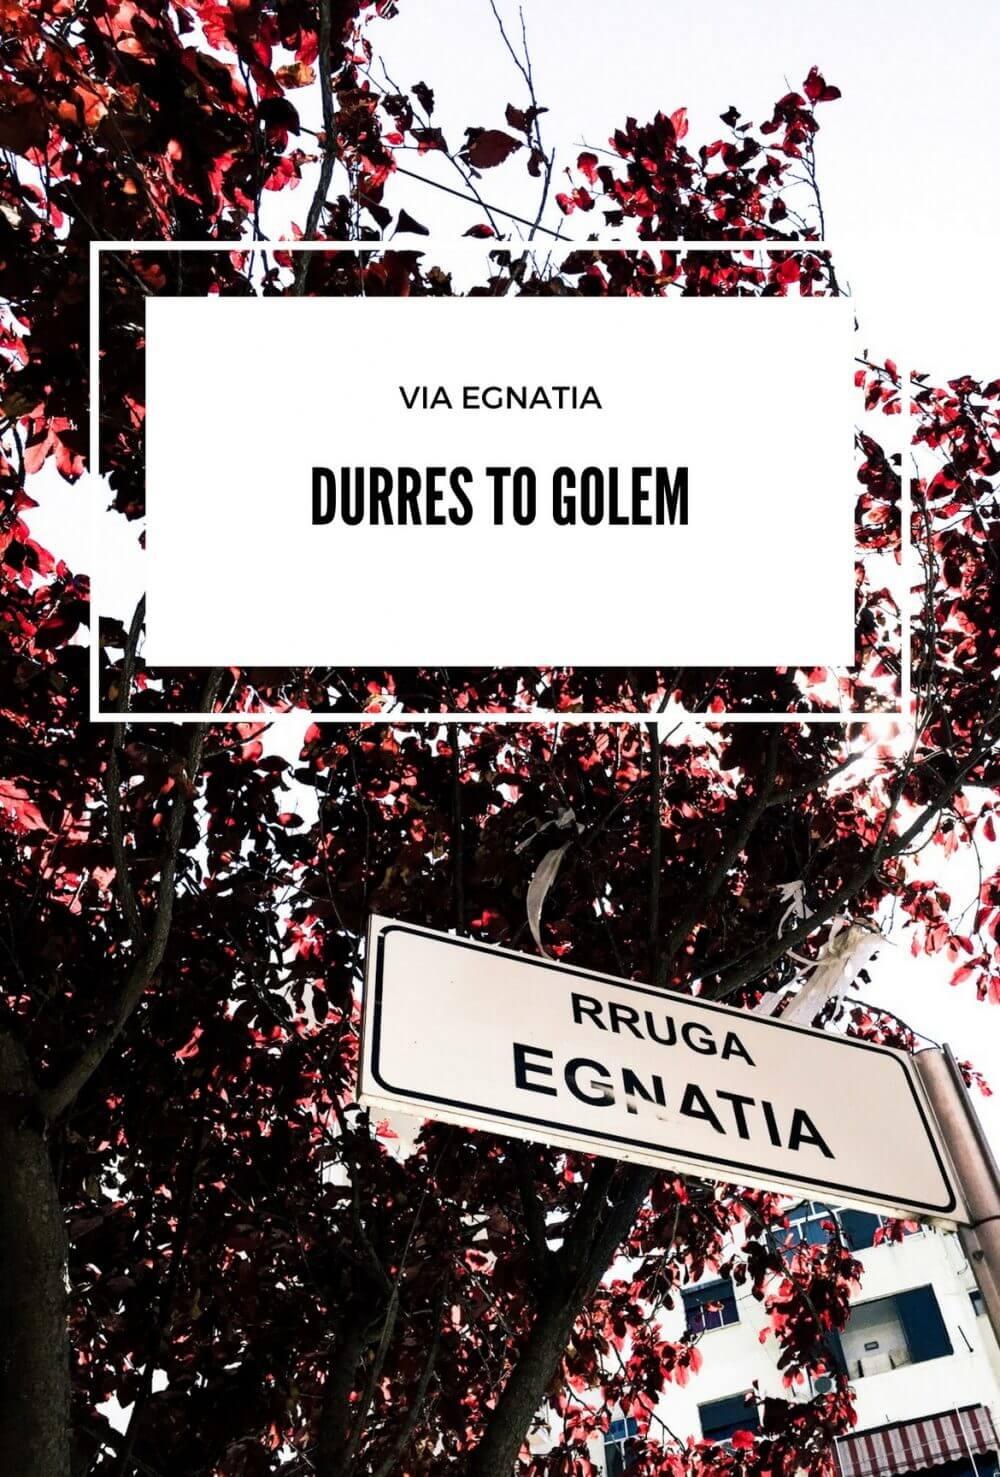 Via Egnatia: Durres to Golem